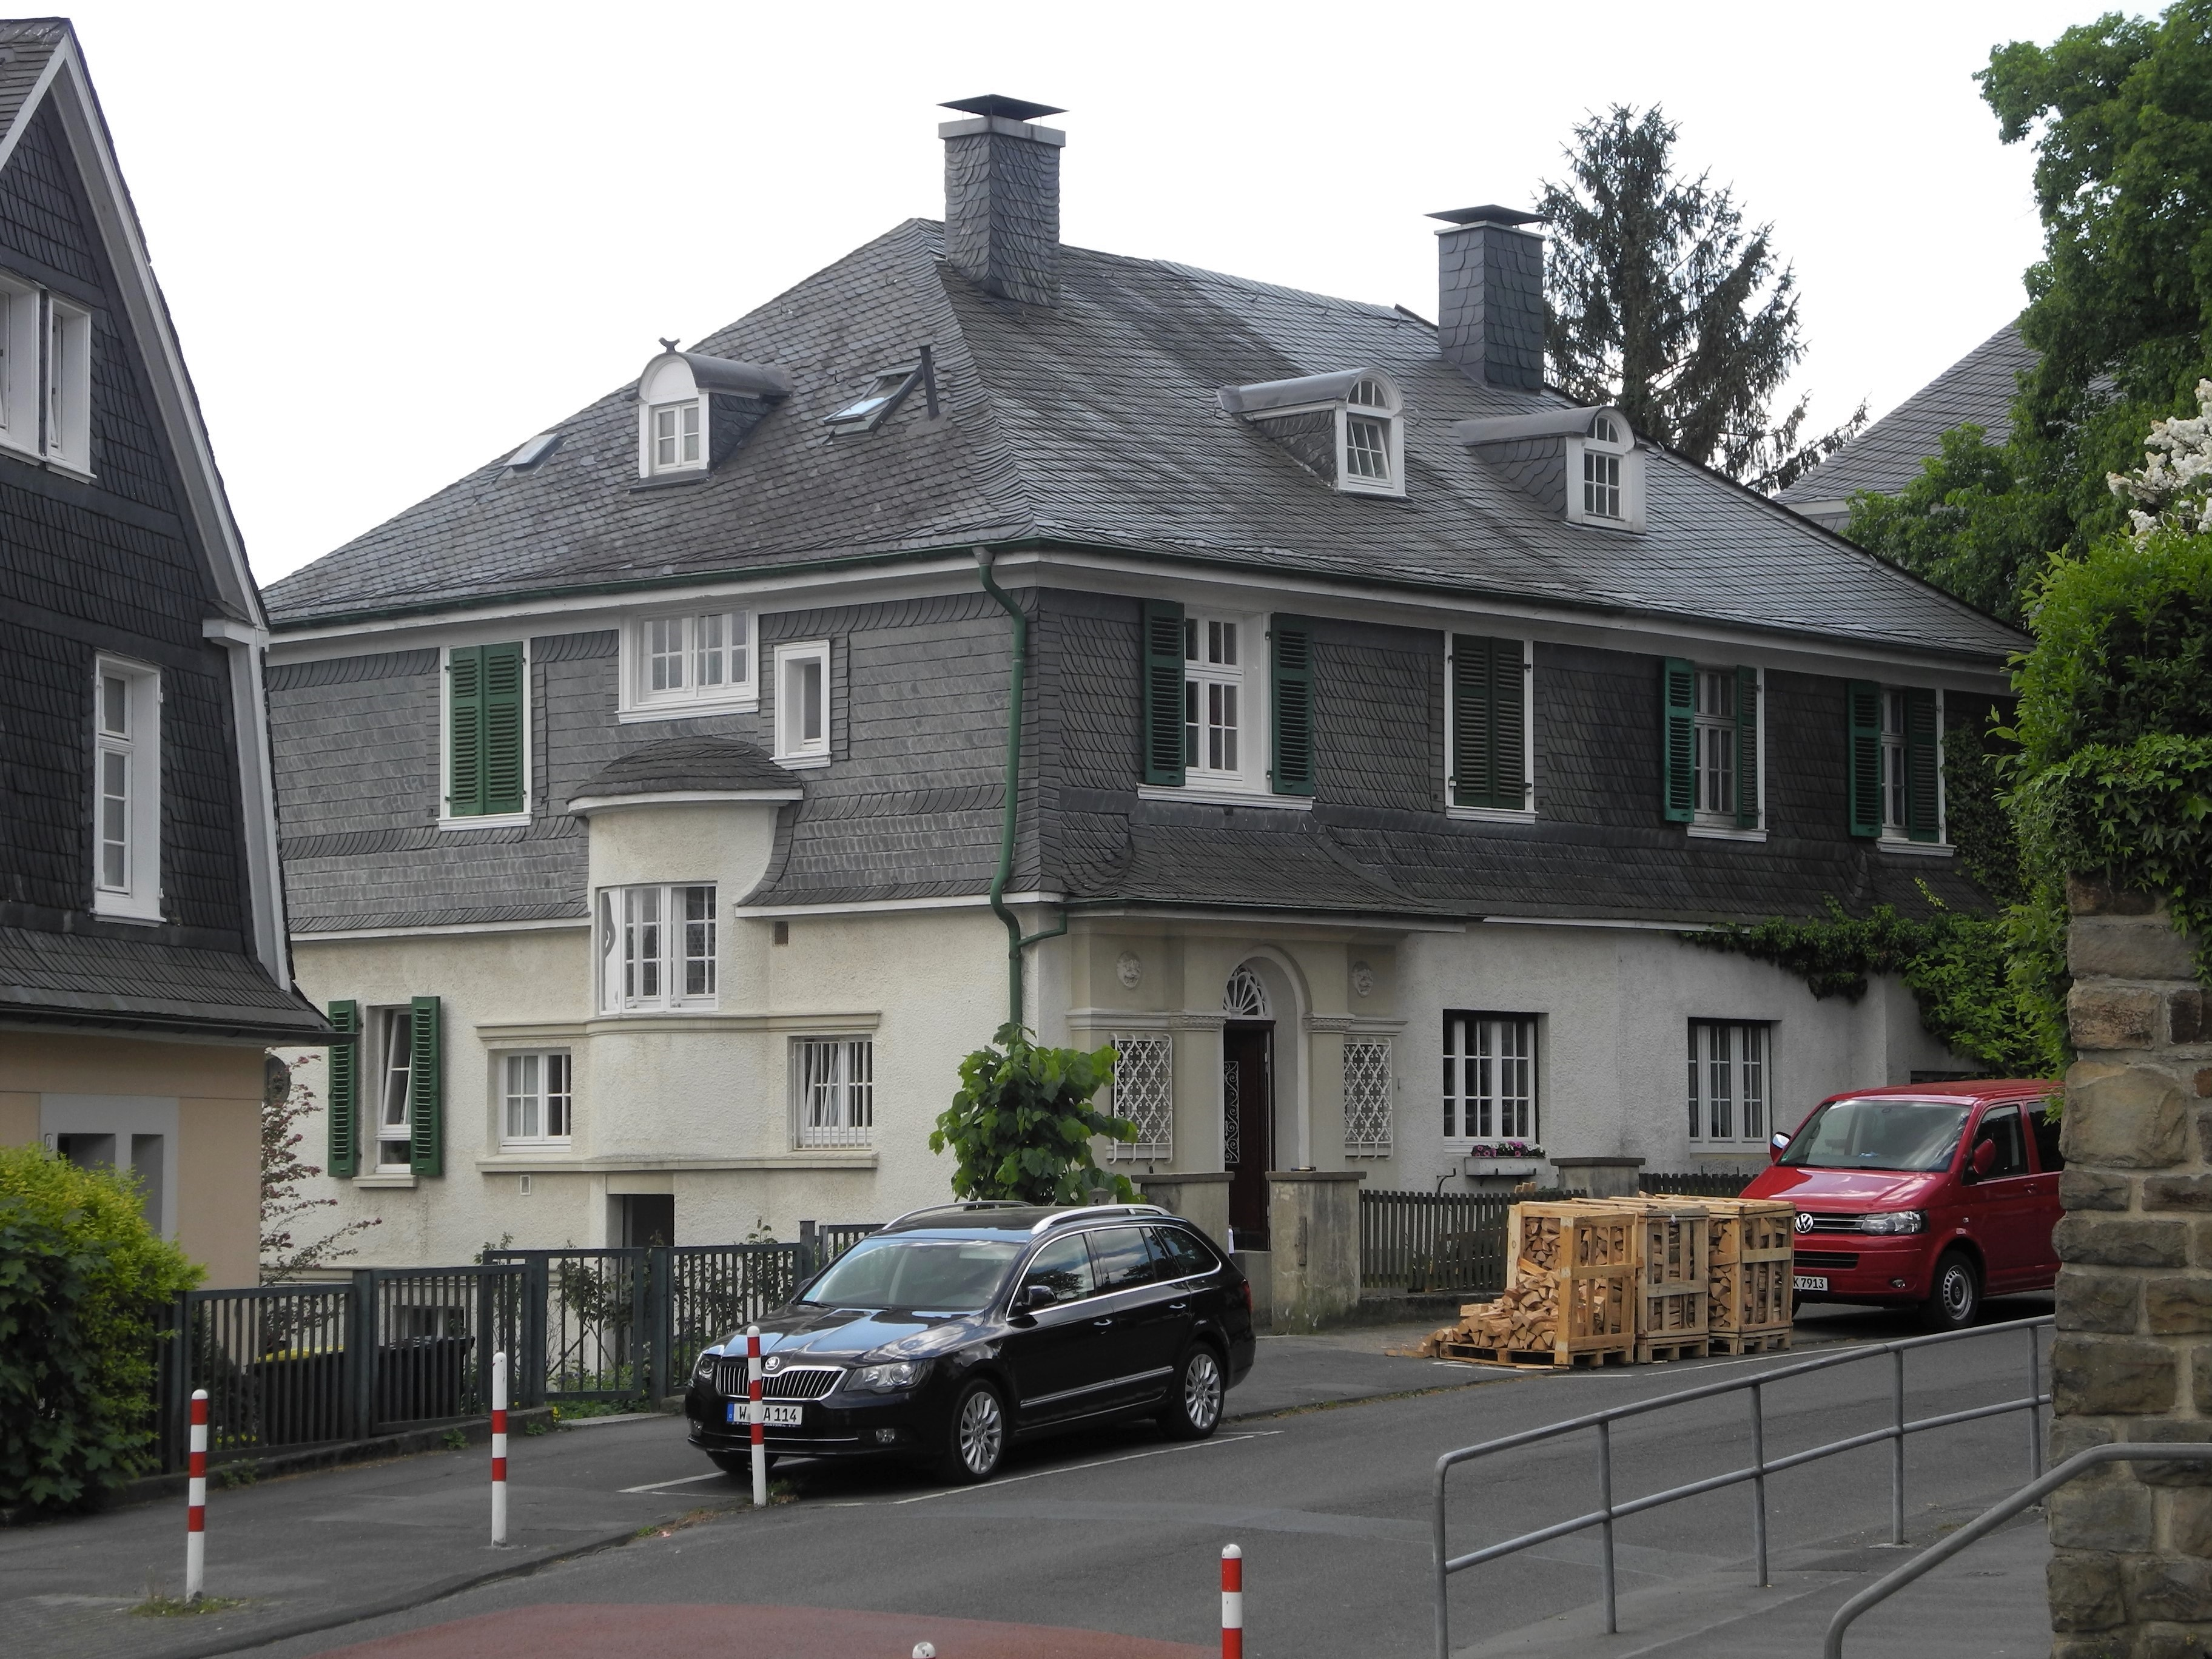 File:Wuppertal, Leipziger Str. 4 + 6, über Eck.jpg - Wikimedia Commons